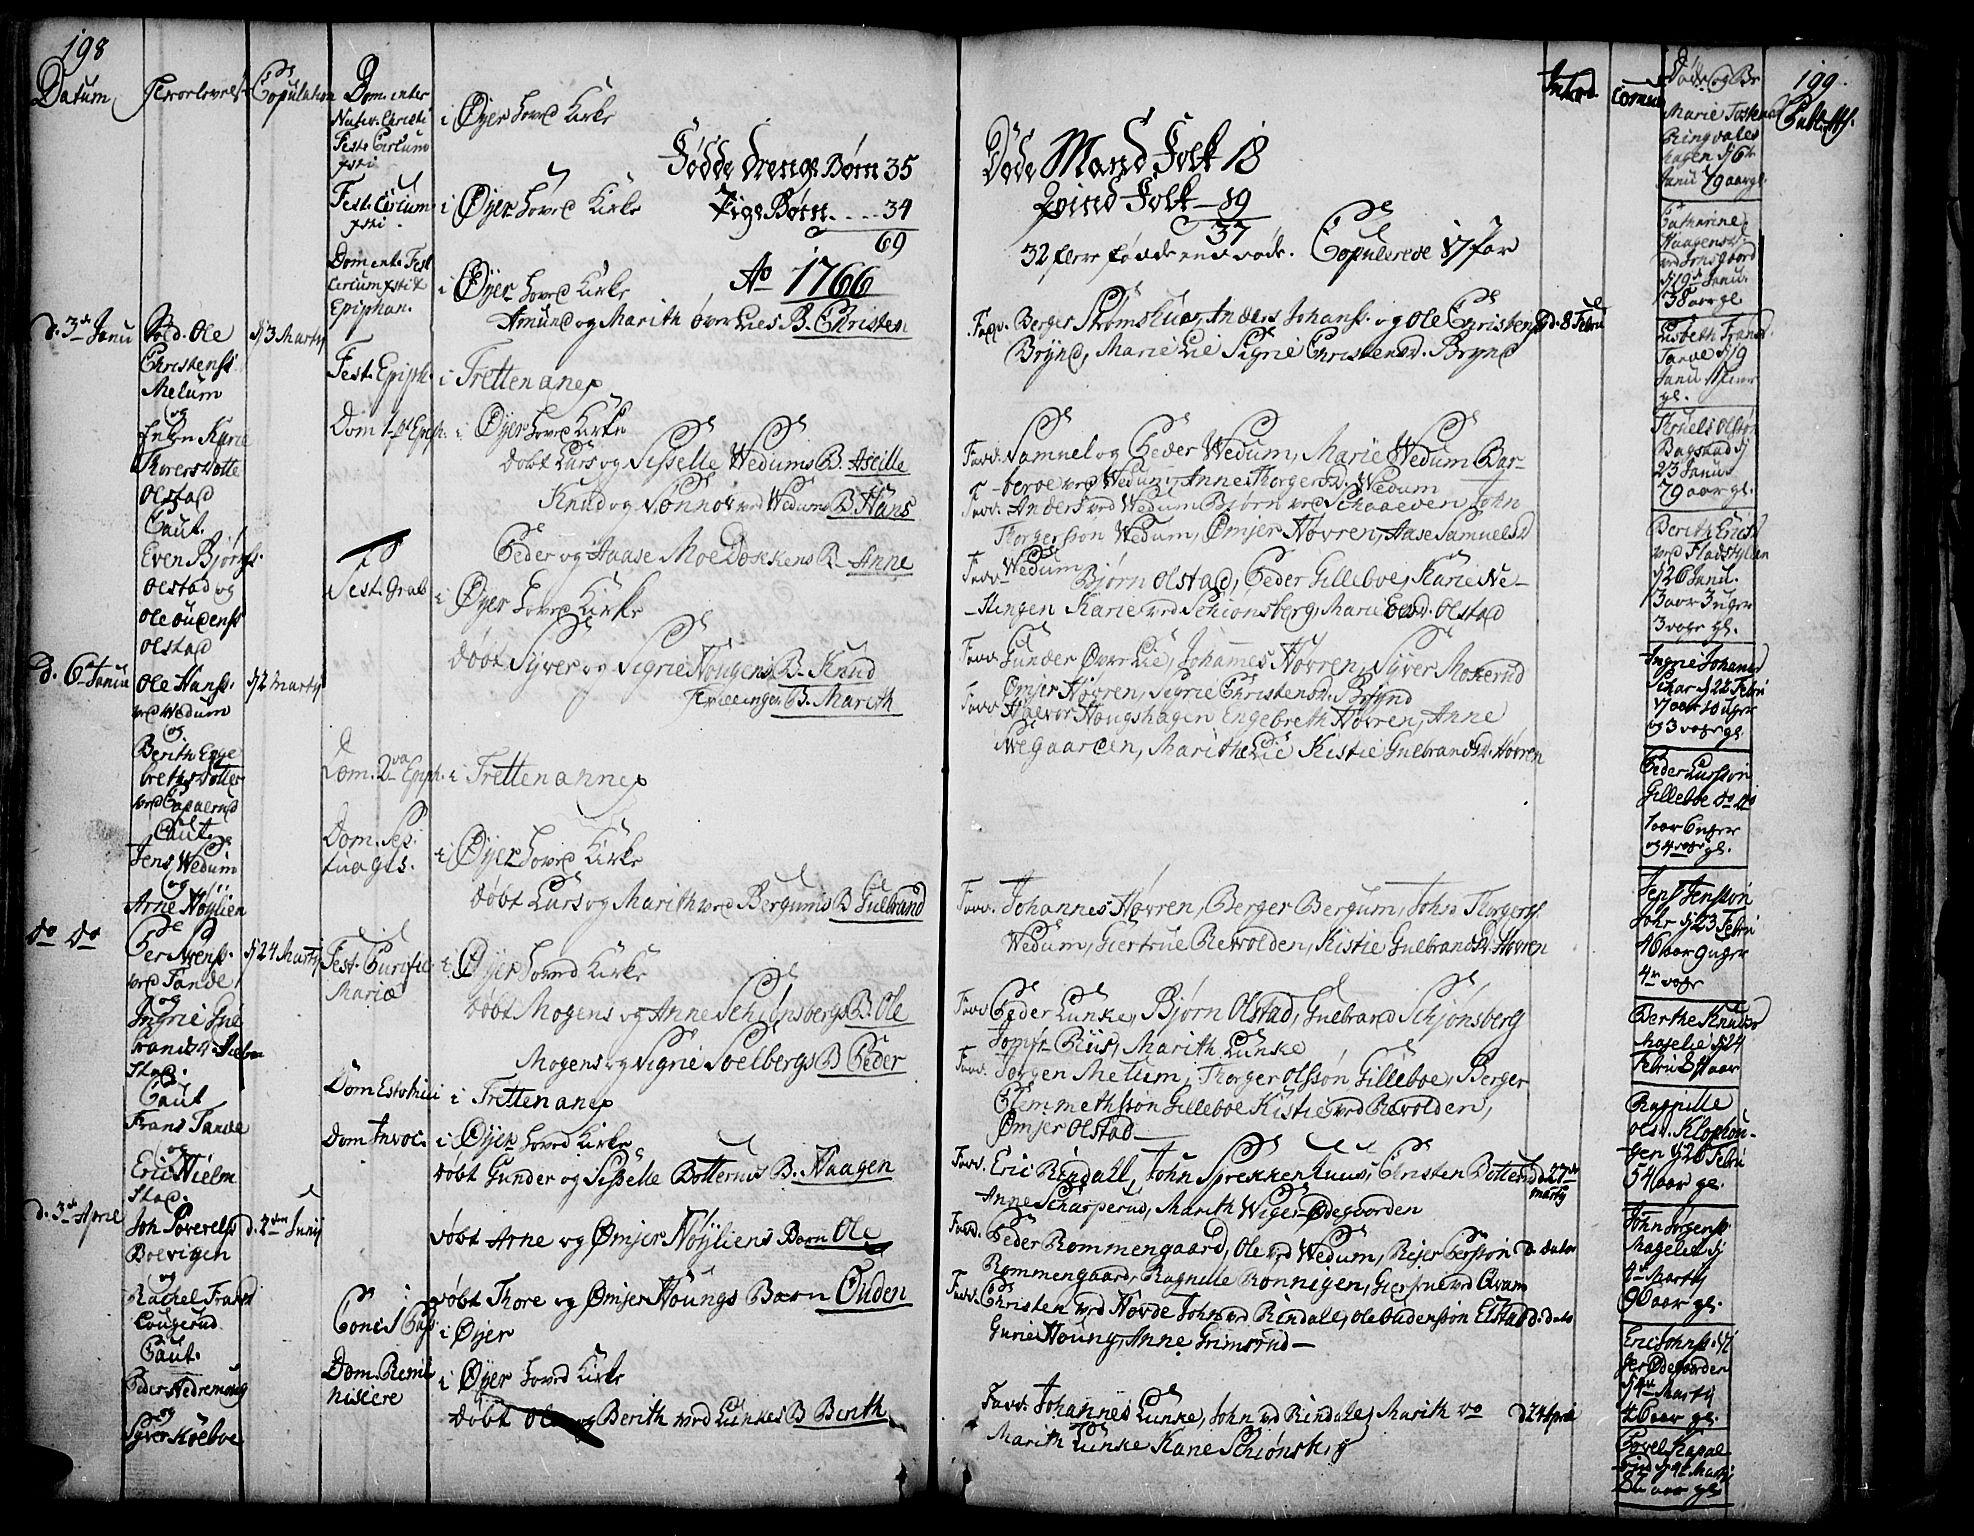 SAH, Øyer prestekontor, Ministerialbok nr. 2, 1733-1784, s. 198-199